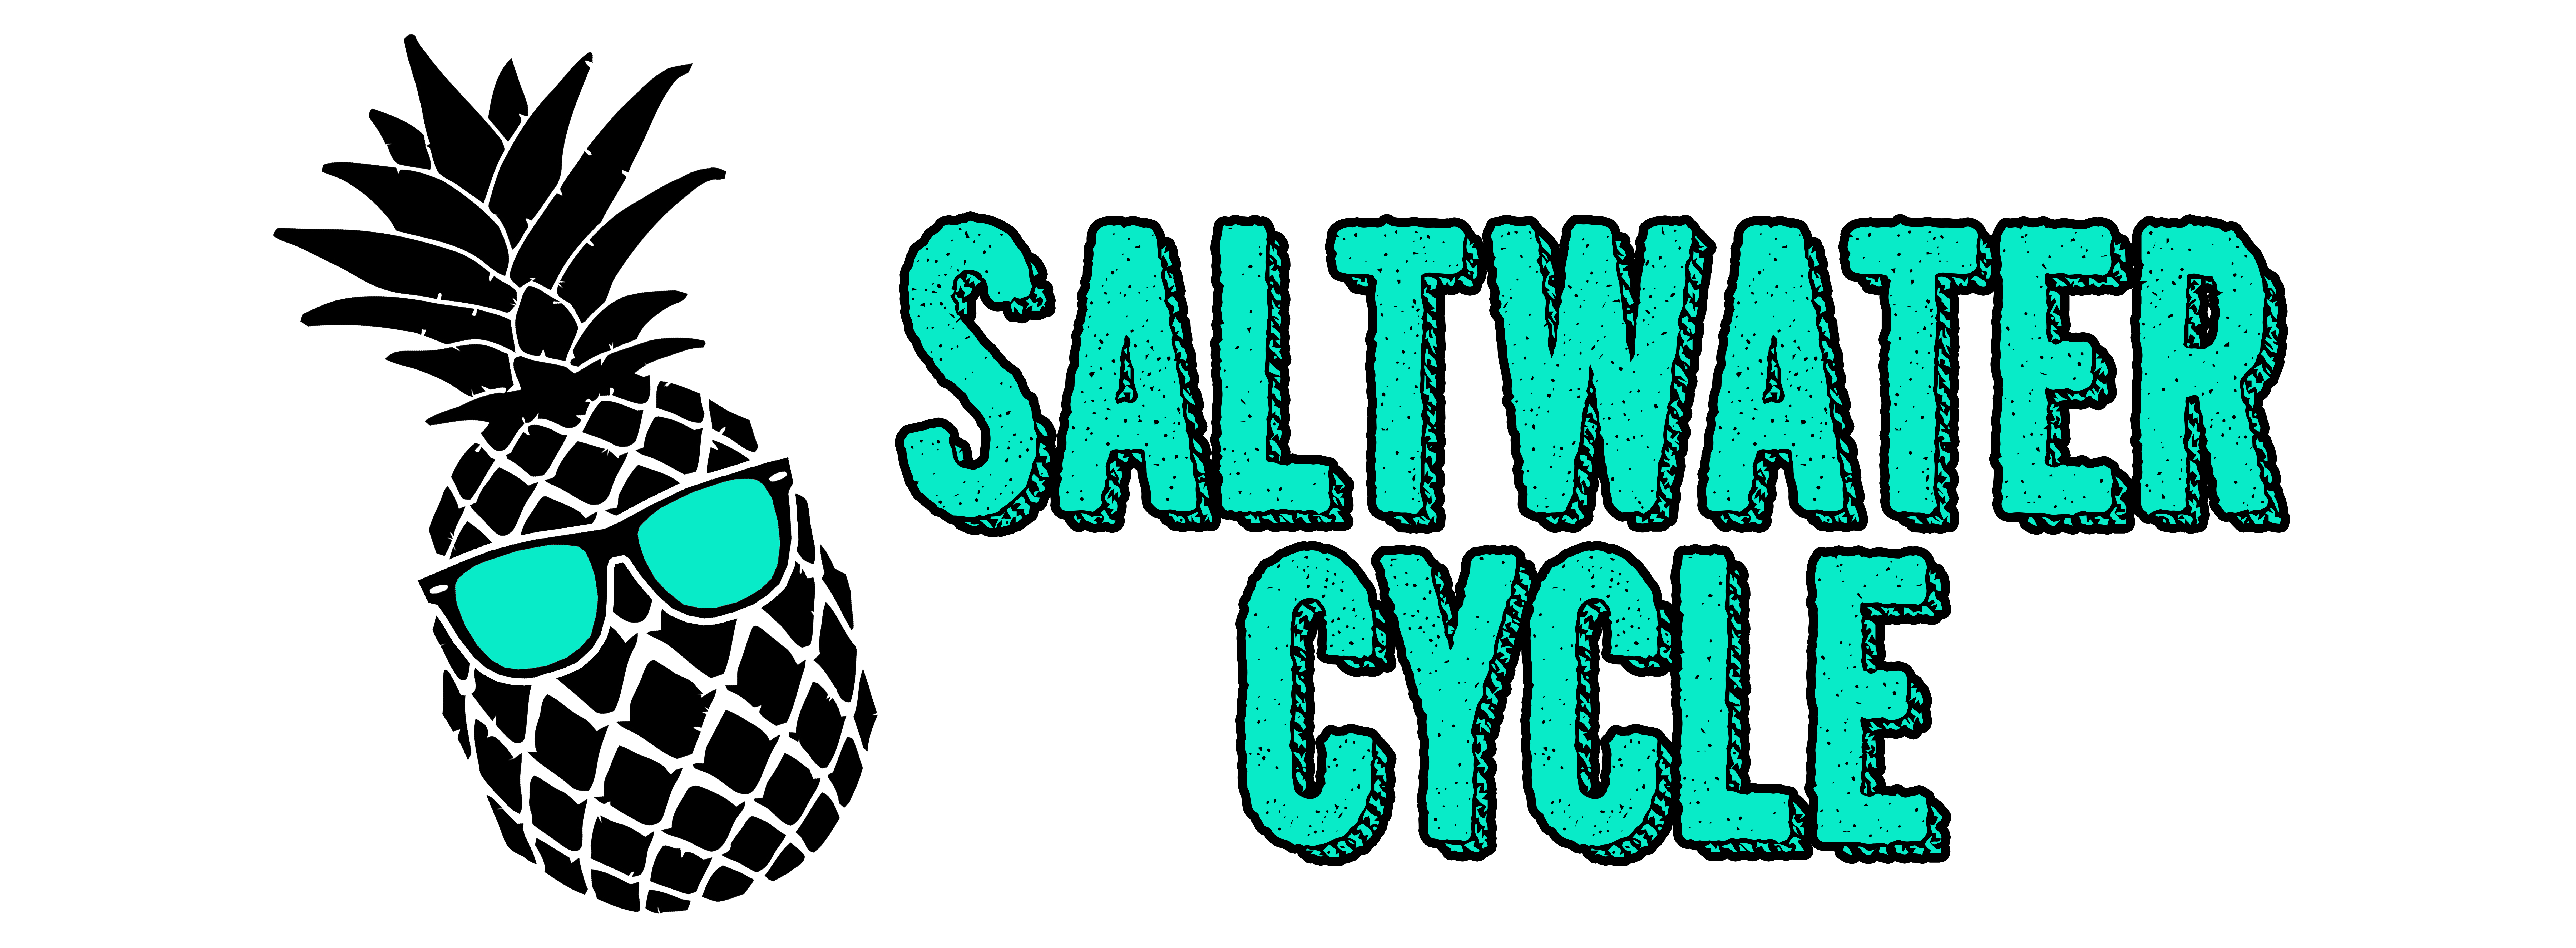 Saltwater Cycle reviews | Boat Tours at 33 Lockwood Dr - Charleston SC